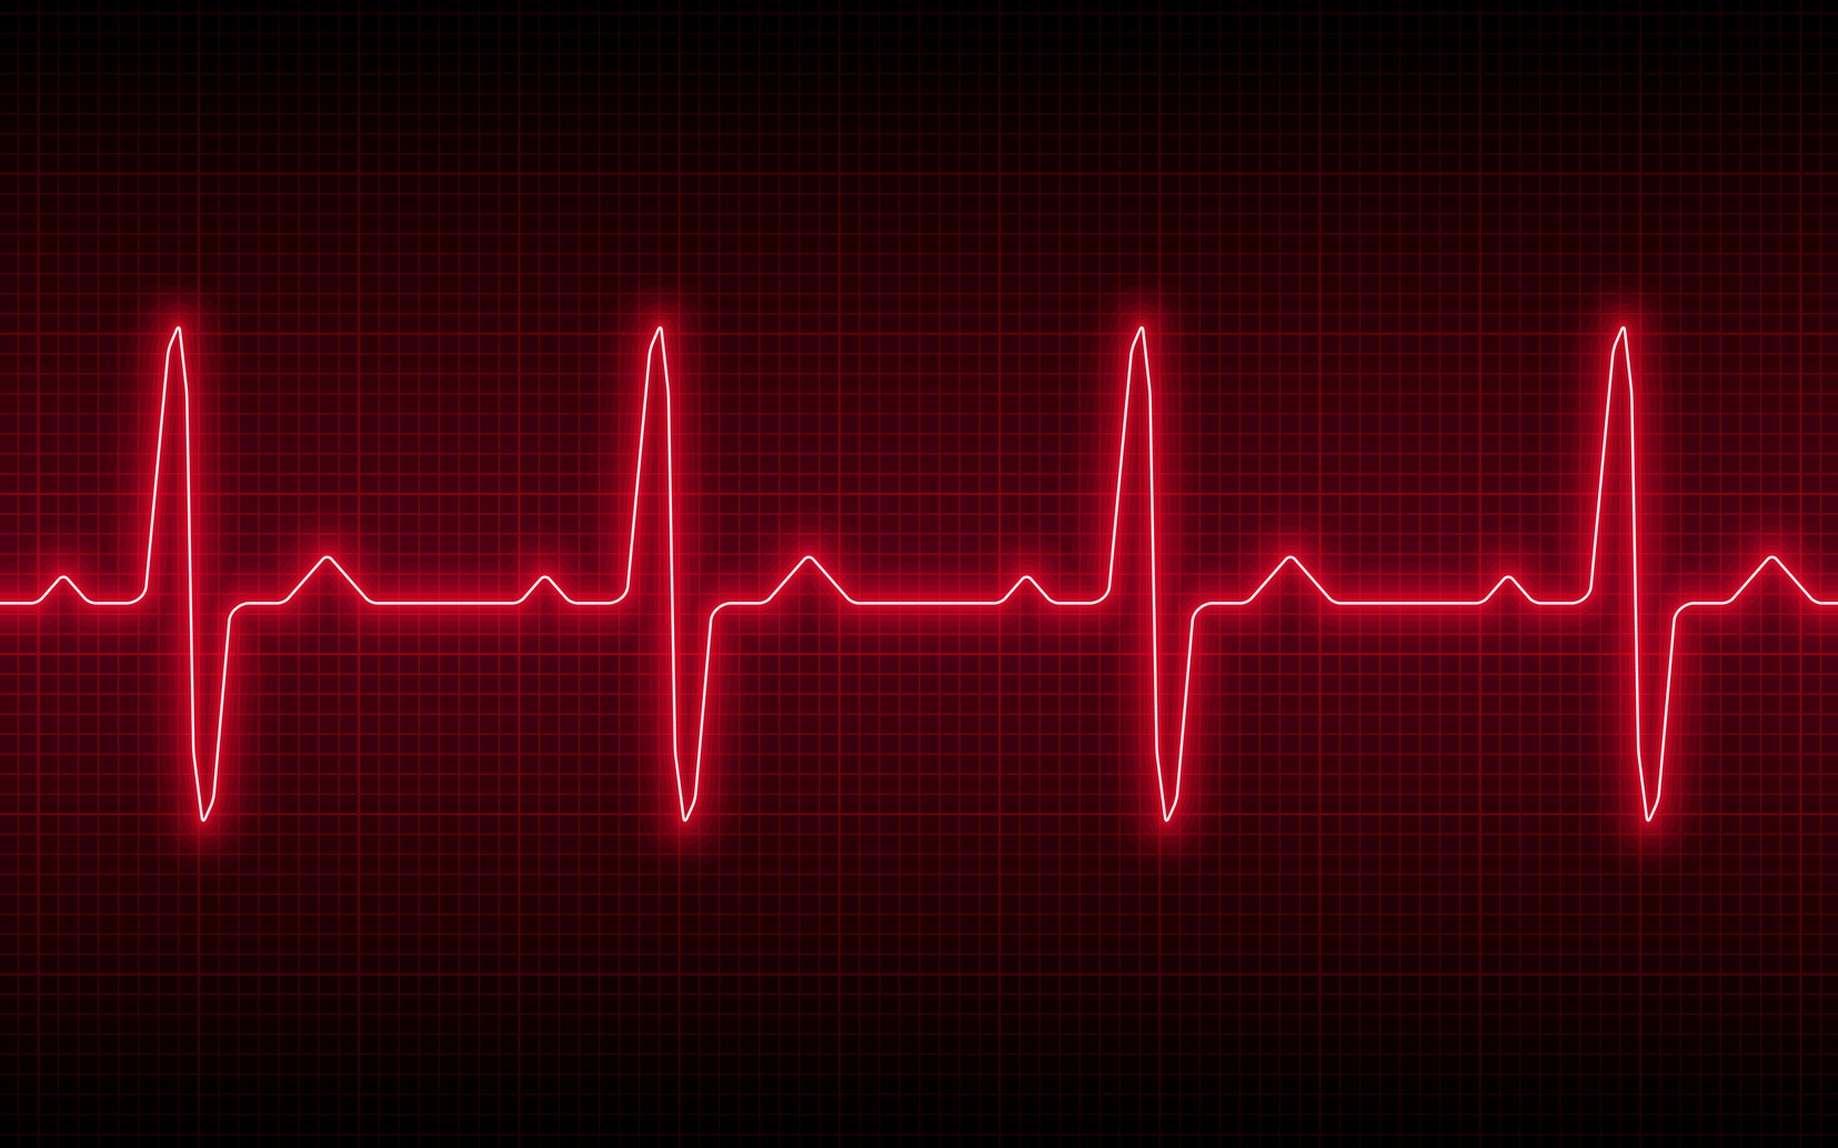 L'arythmie est une anomalie du rythme cardiaque. © Vladislav Vasiullin, Fotolia